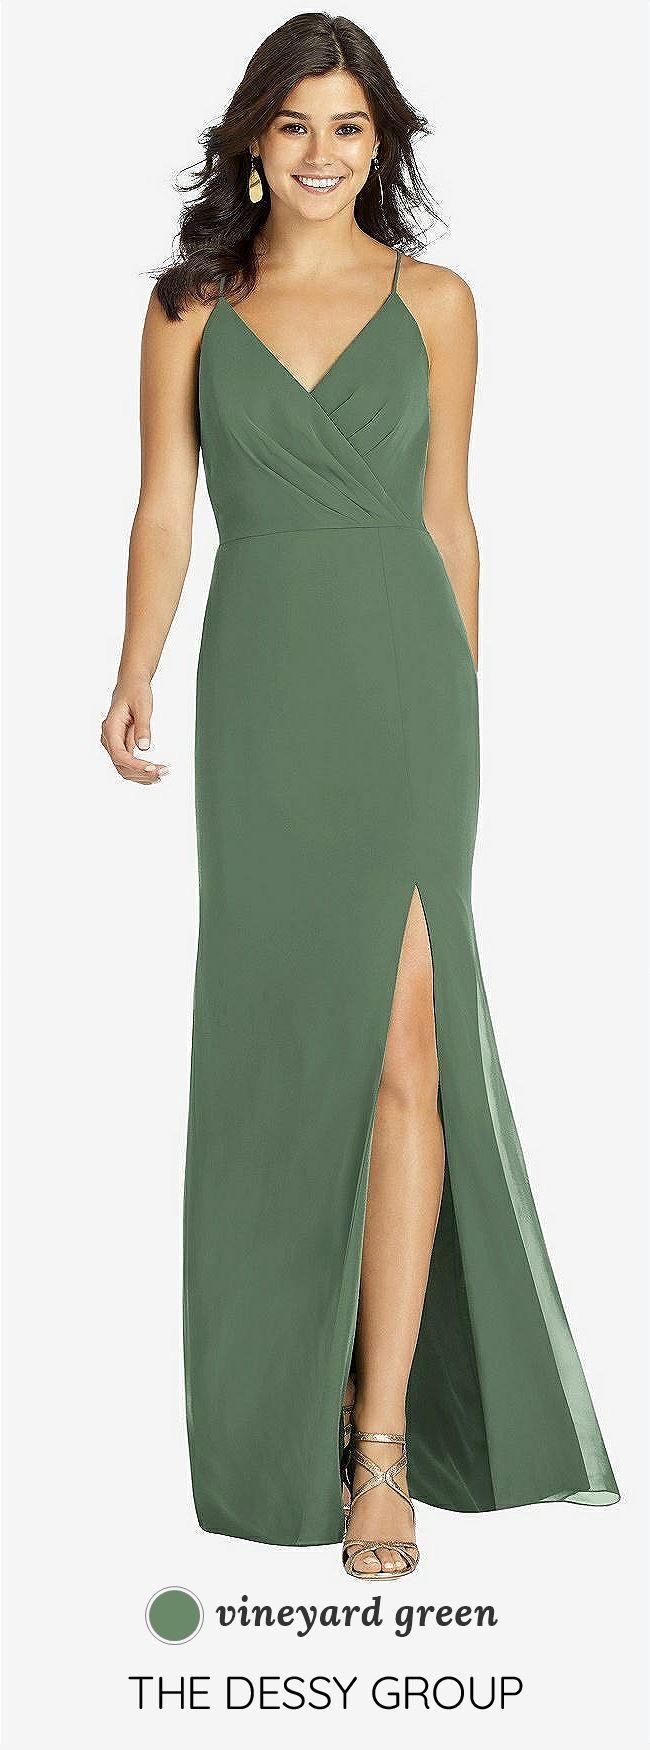 Mismatched Dark Sage Green Bridesmaid Dresses Sage Green Bridesmaid Dress Light Green Bridesmaid Dresses Olive Green Bridesmaid Dresses [ 1750 x 650 Pixel ]